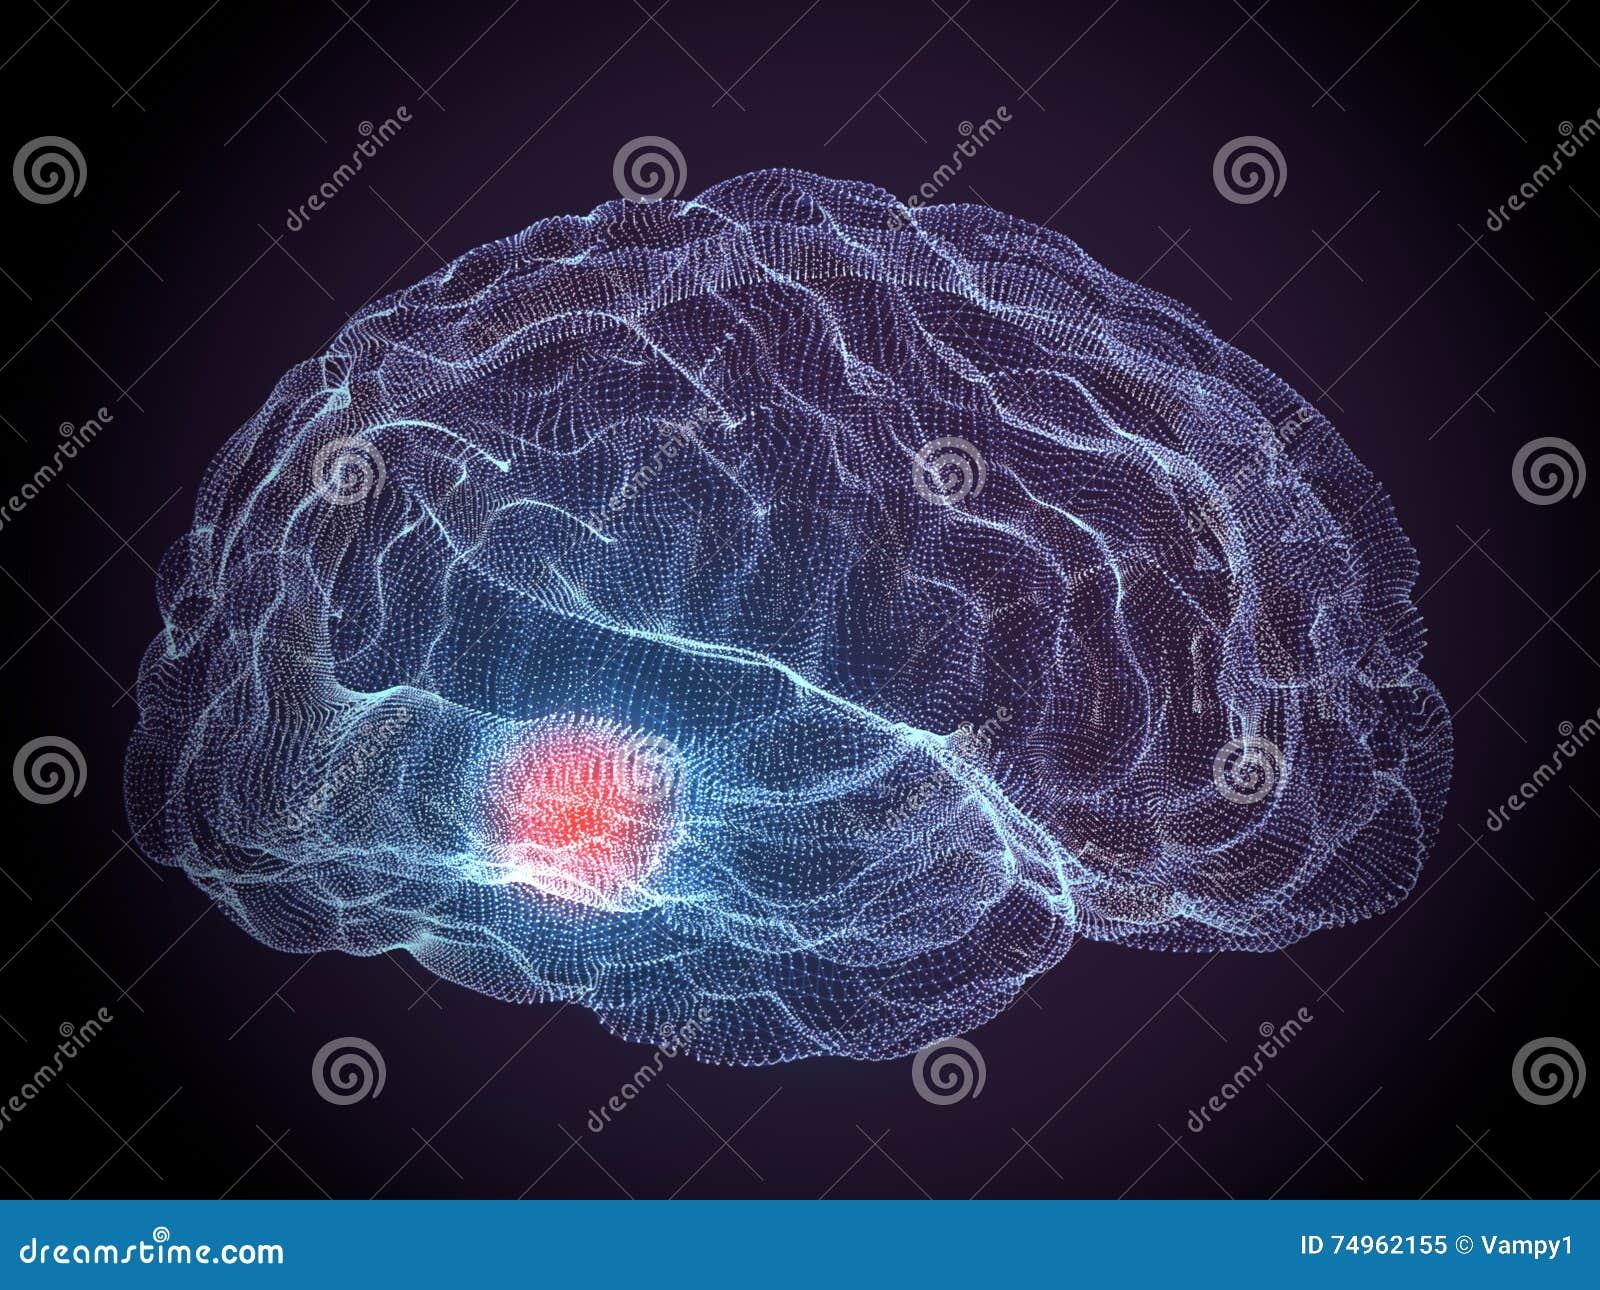 Parkinson degenerative brain diseases